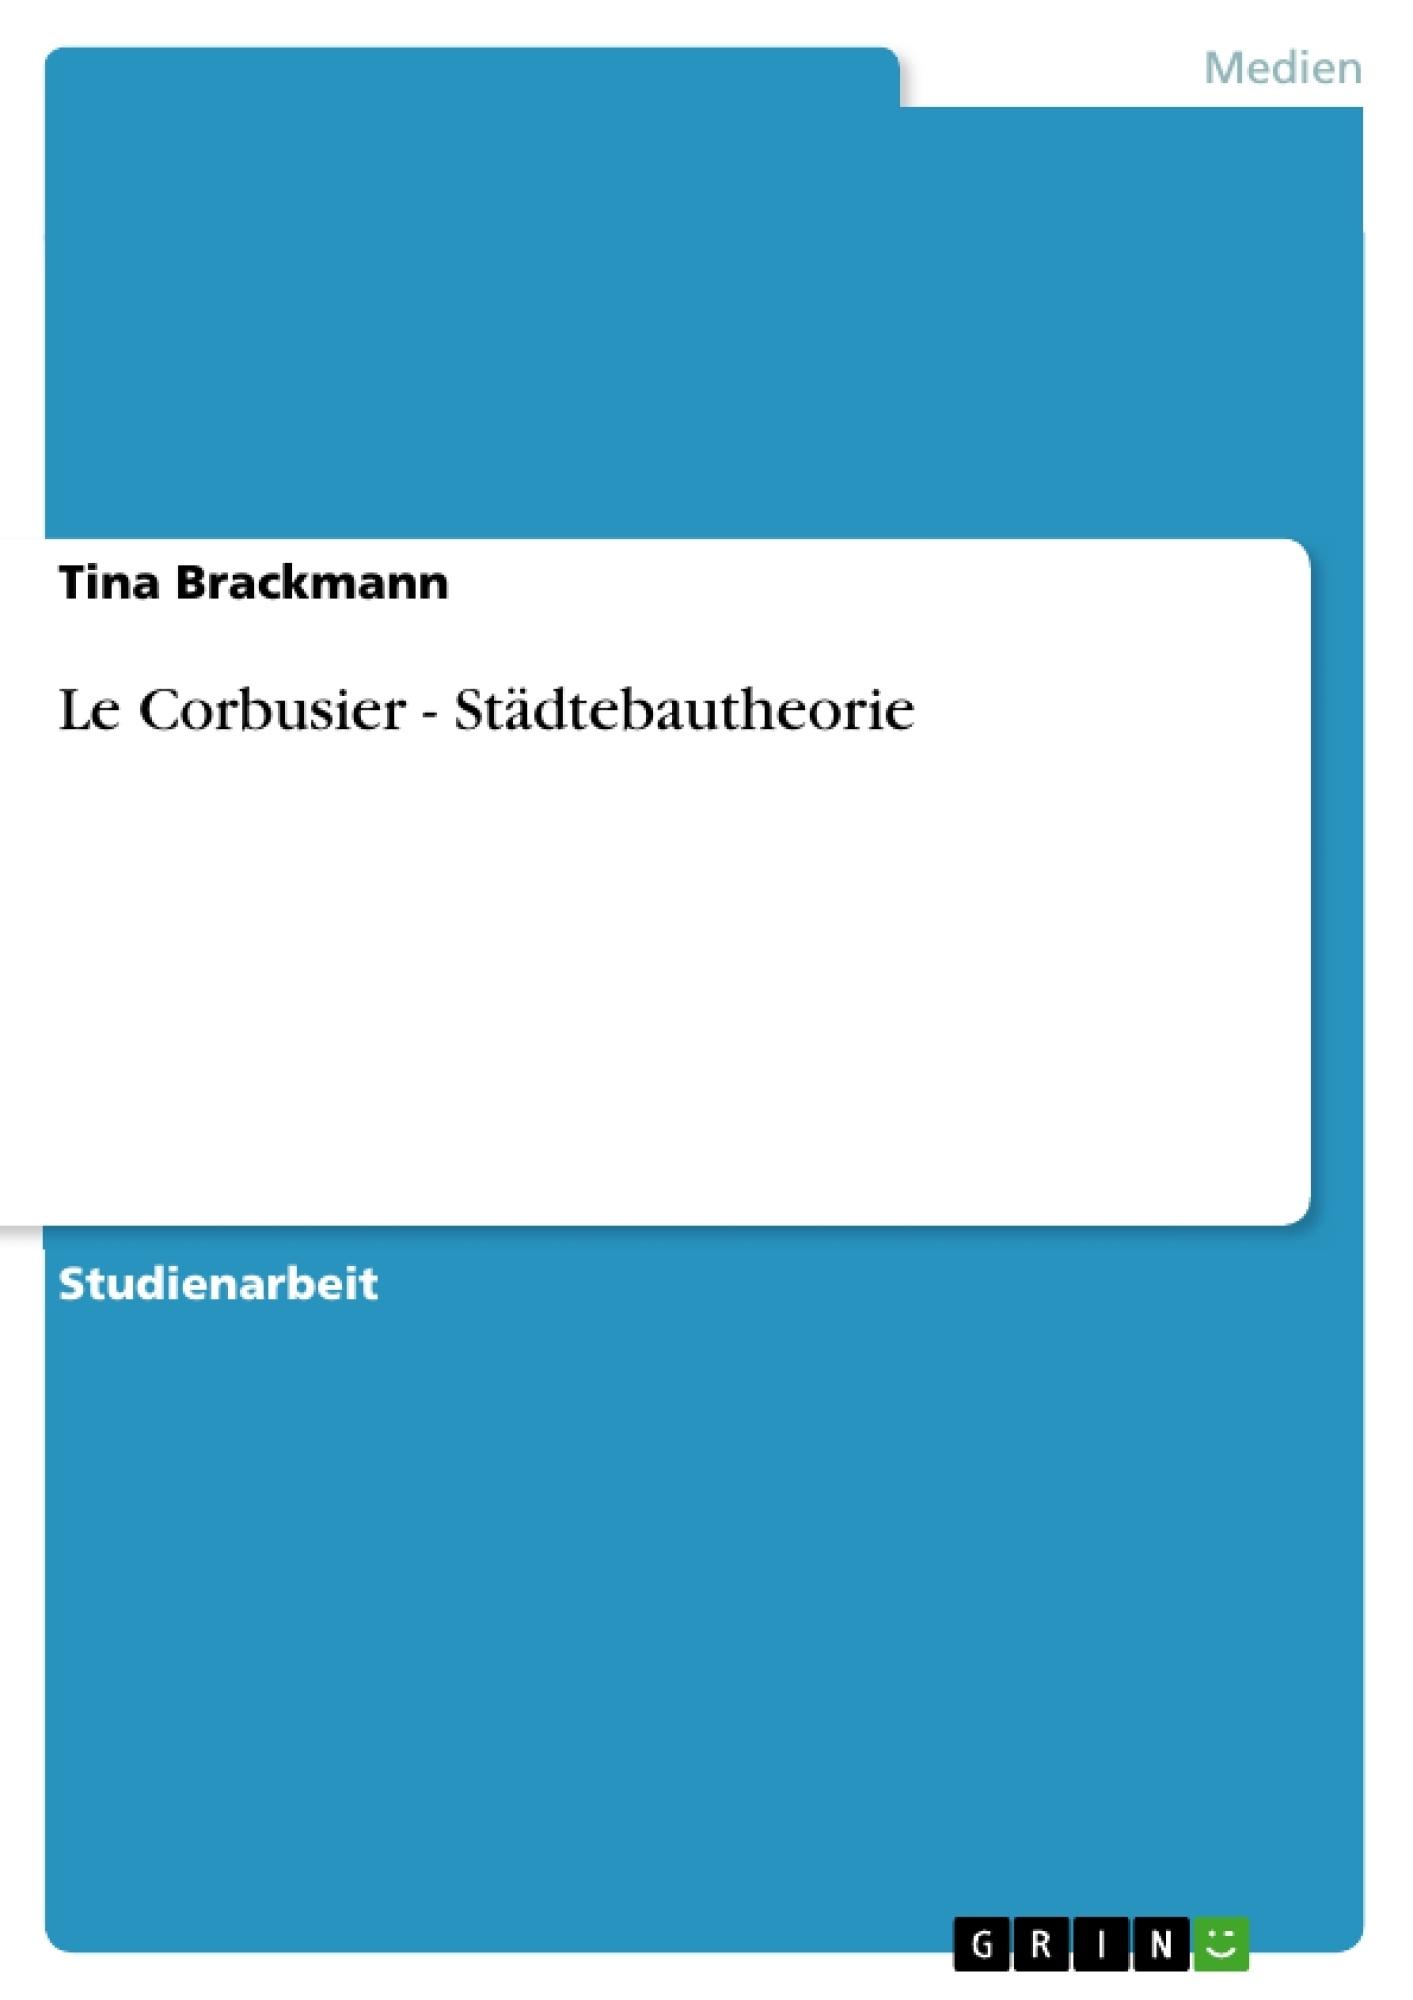 Titel: Le Corbusier - Städtebautheorie